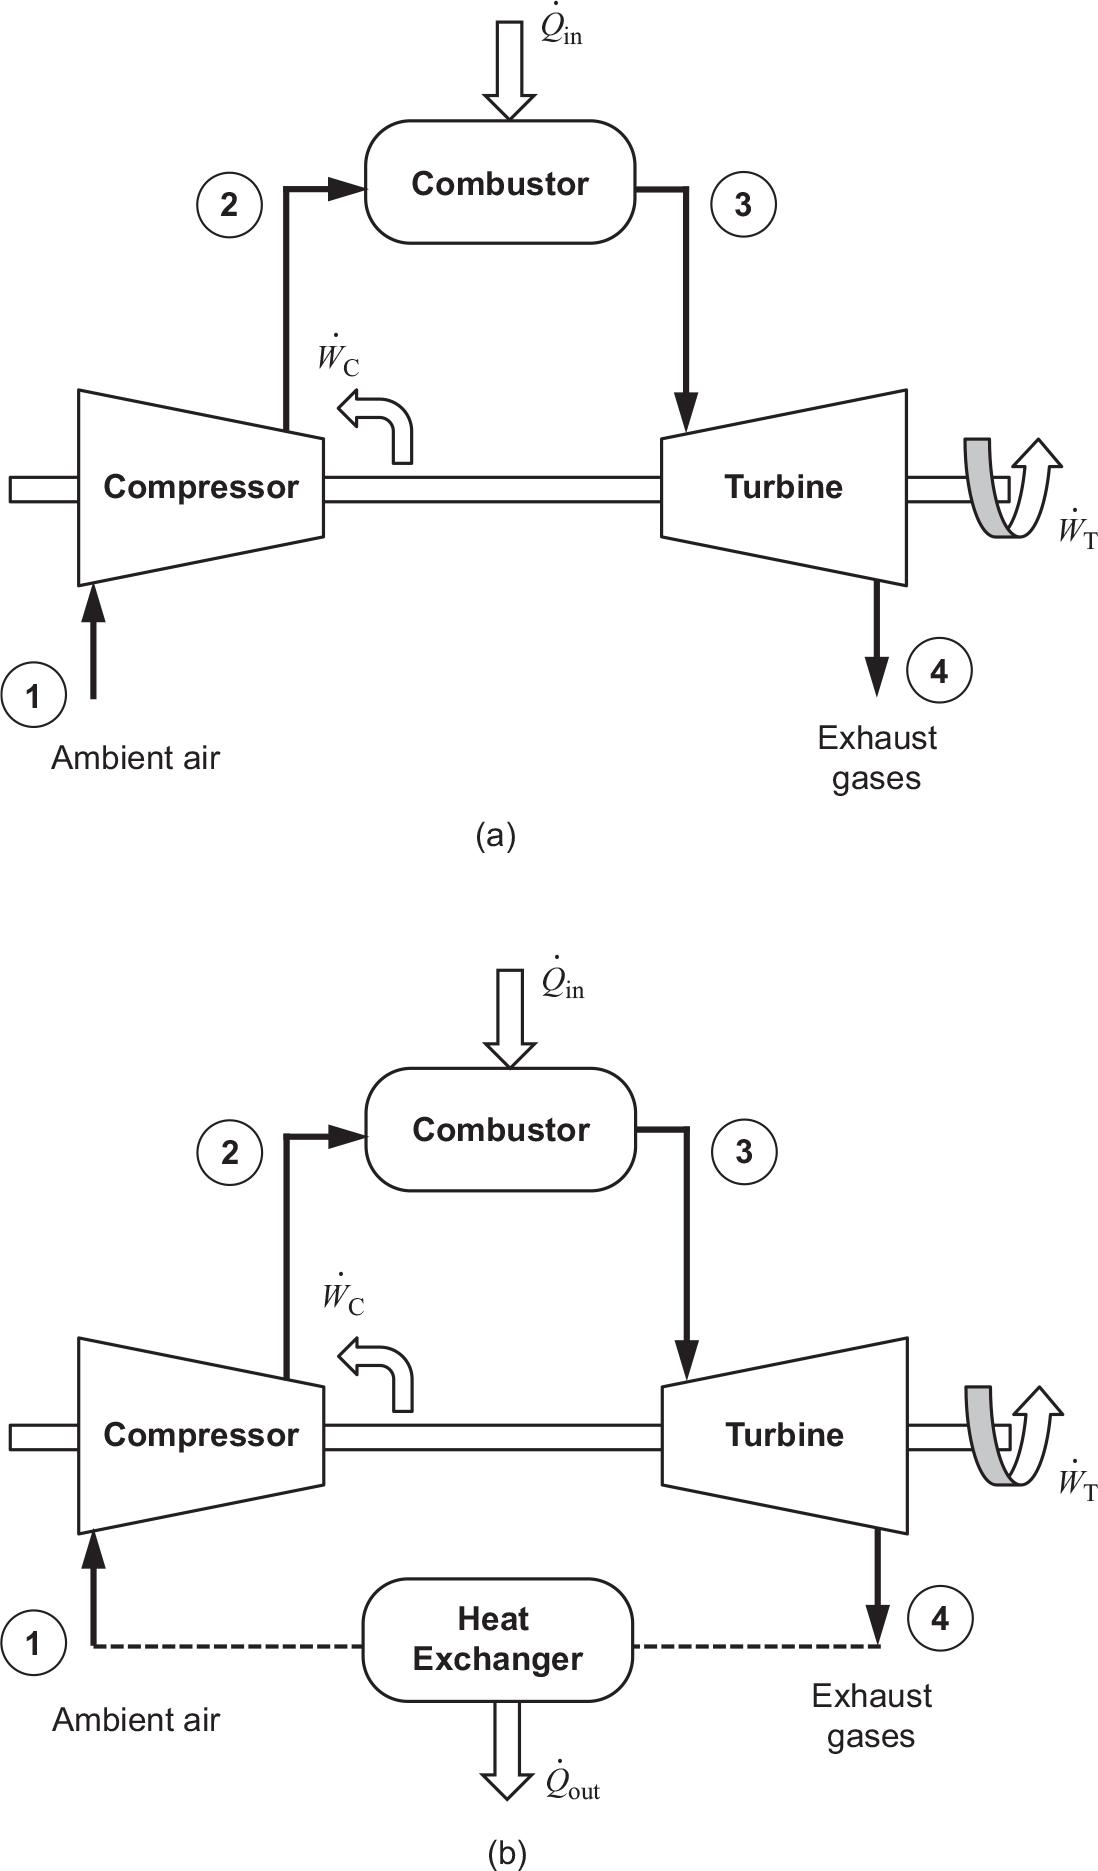 Review of Thermodynamics, Fluid Mechanics, and Heat Transfer